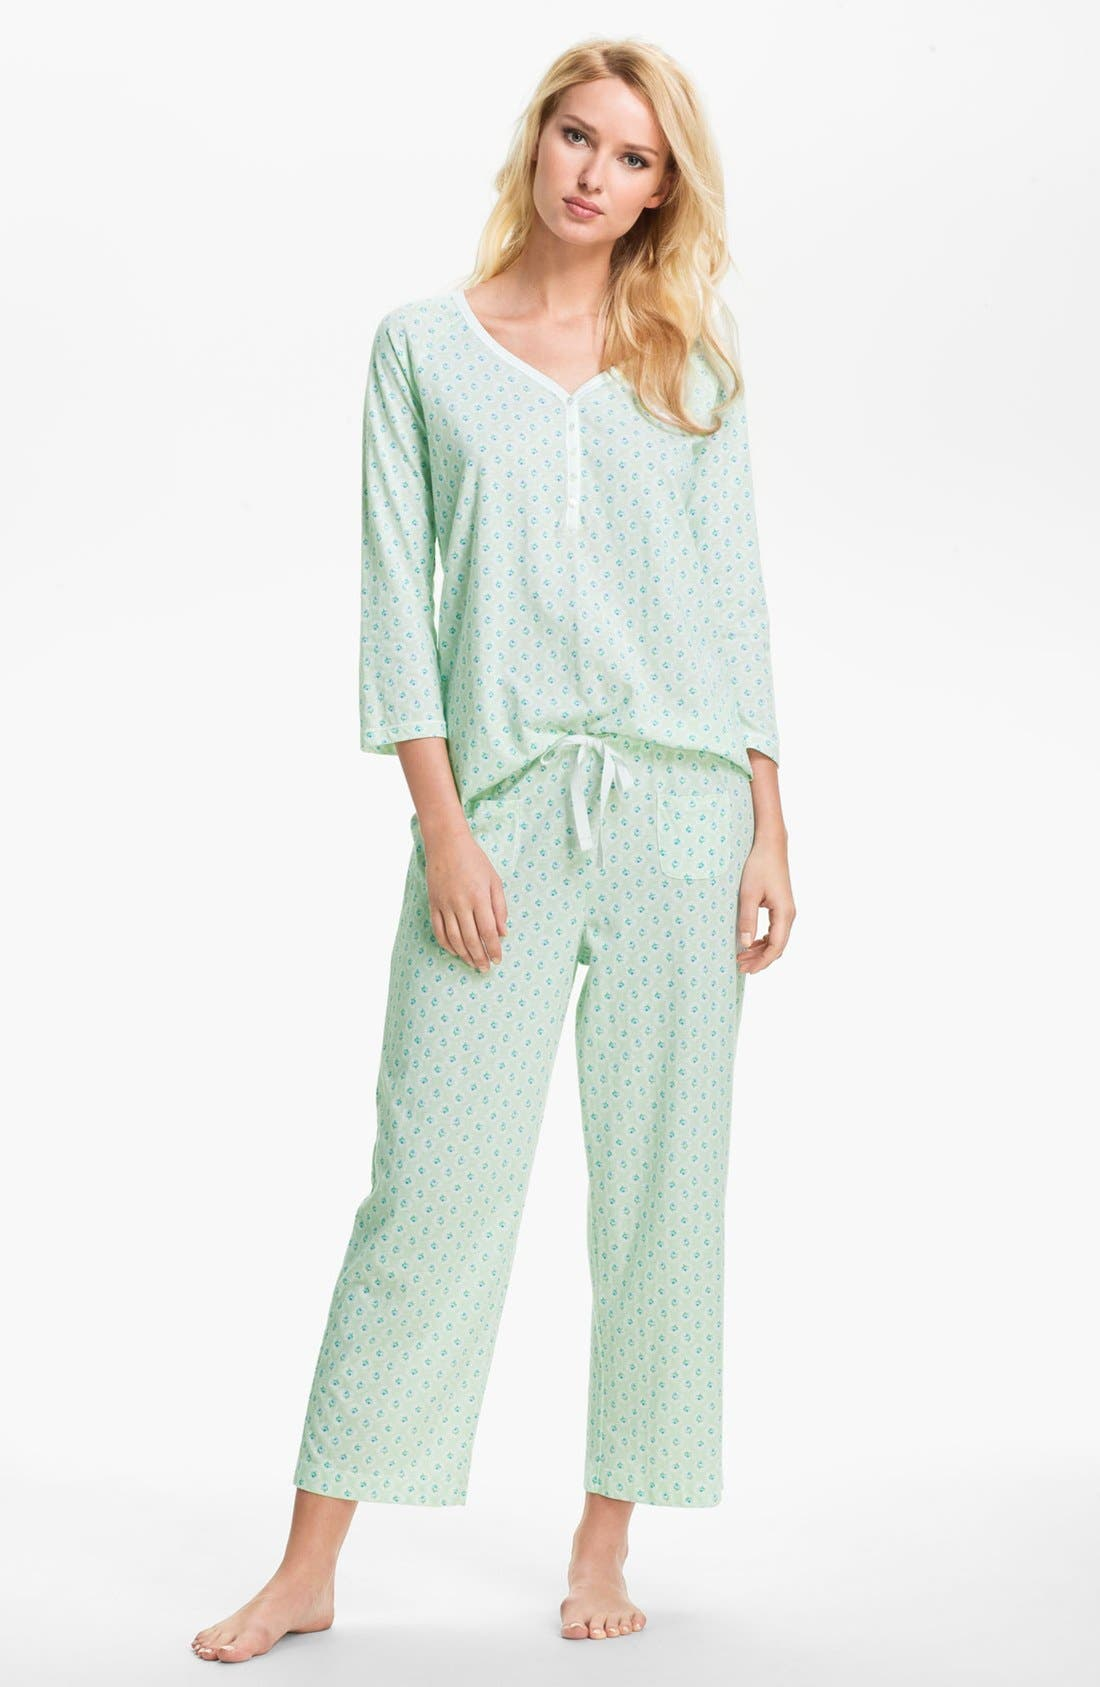 Main Image - Carole Hochman Designs 'Vintage Rose' Pajamas